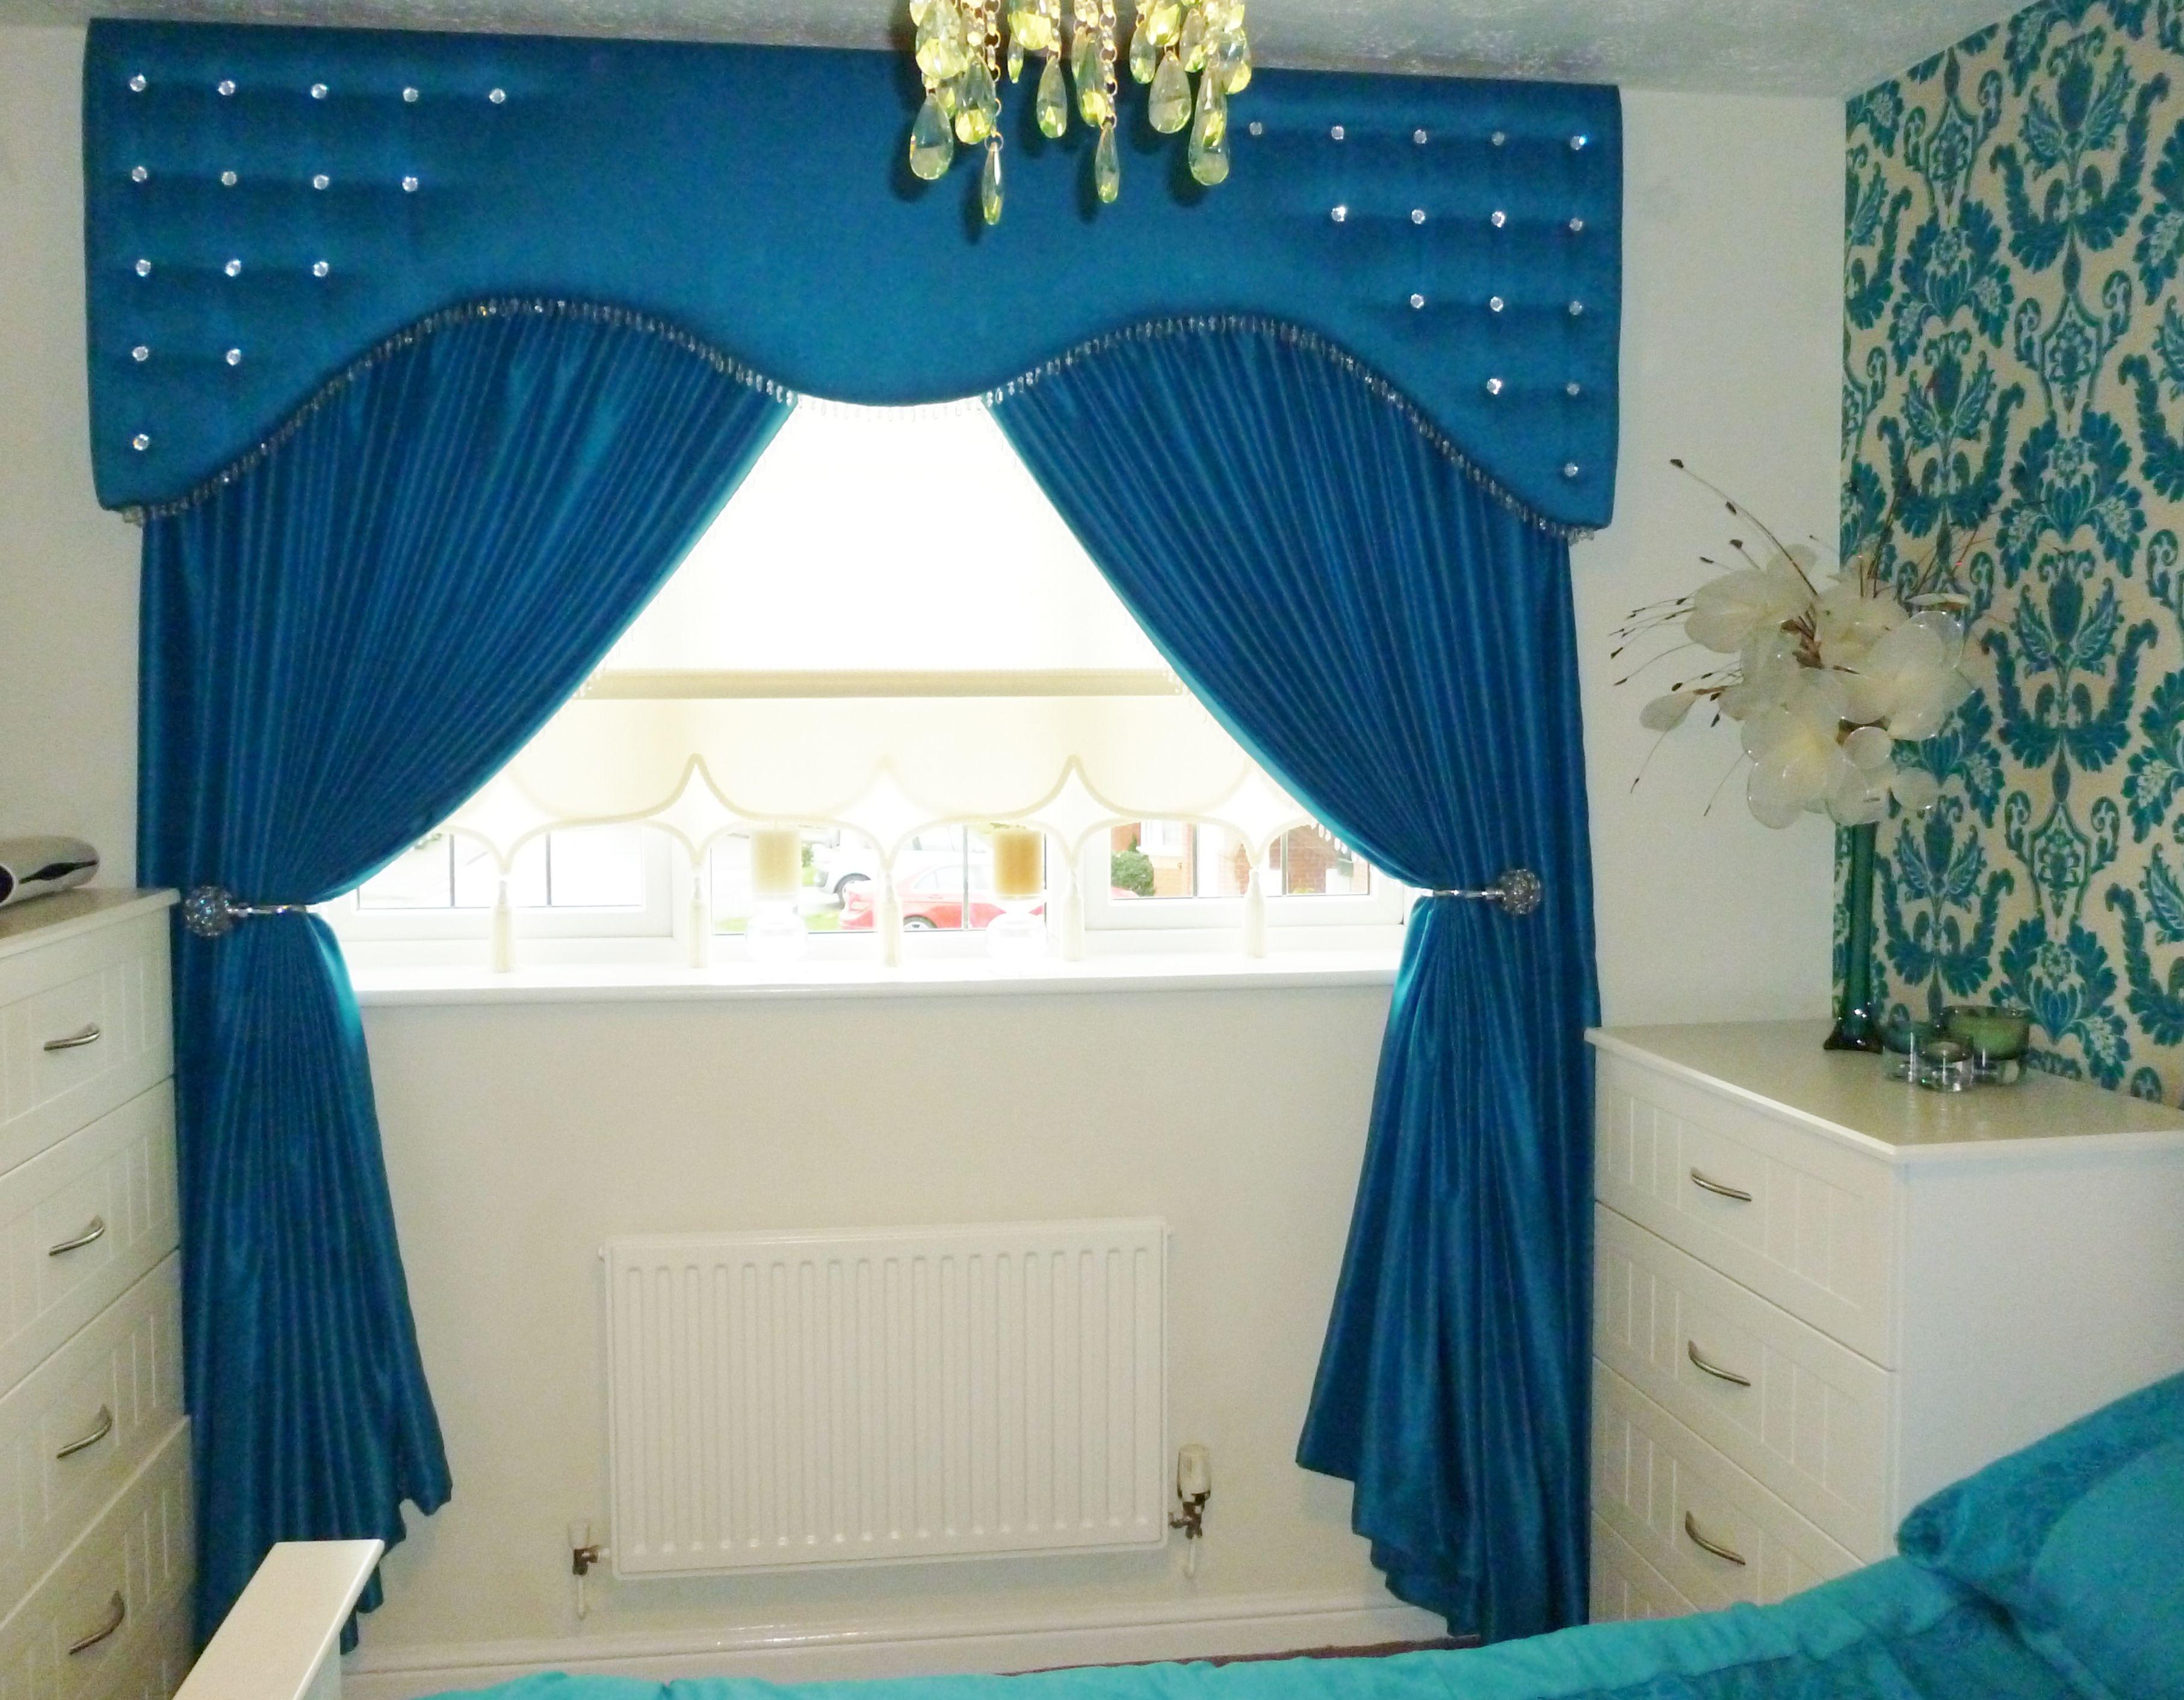 mainstays of curtain com sailcloth blue walmart ip panel set